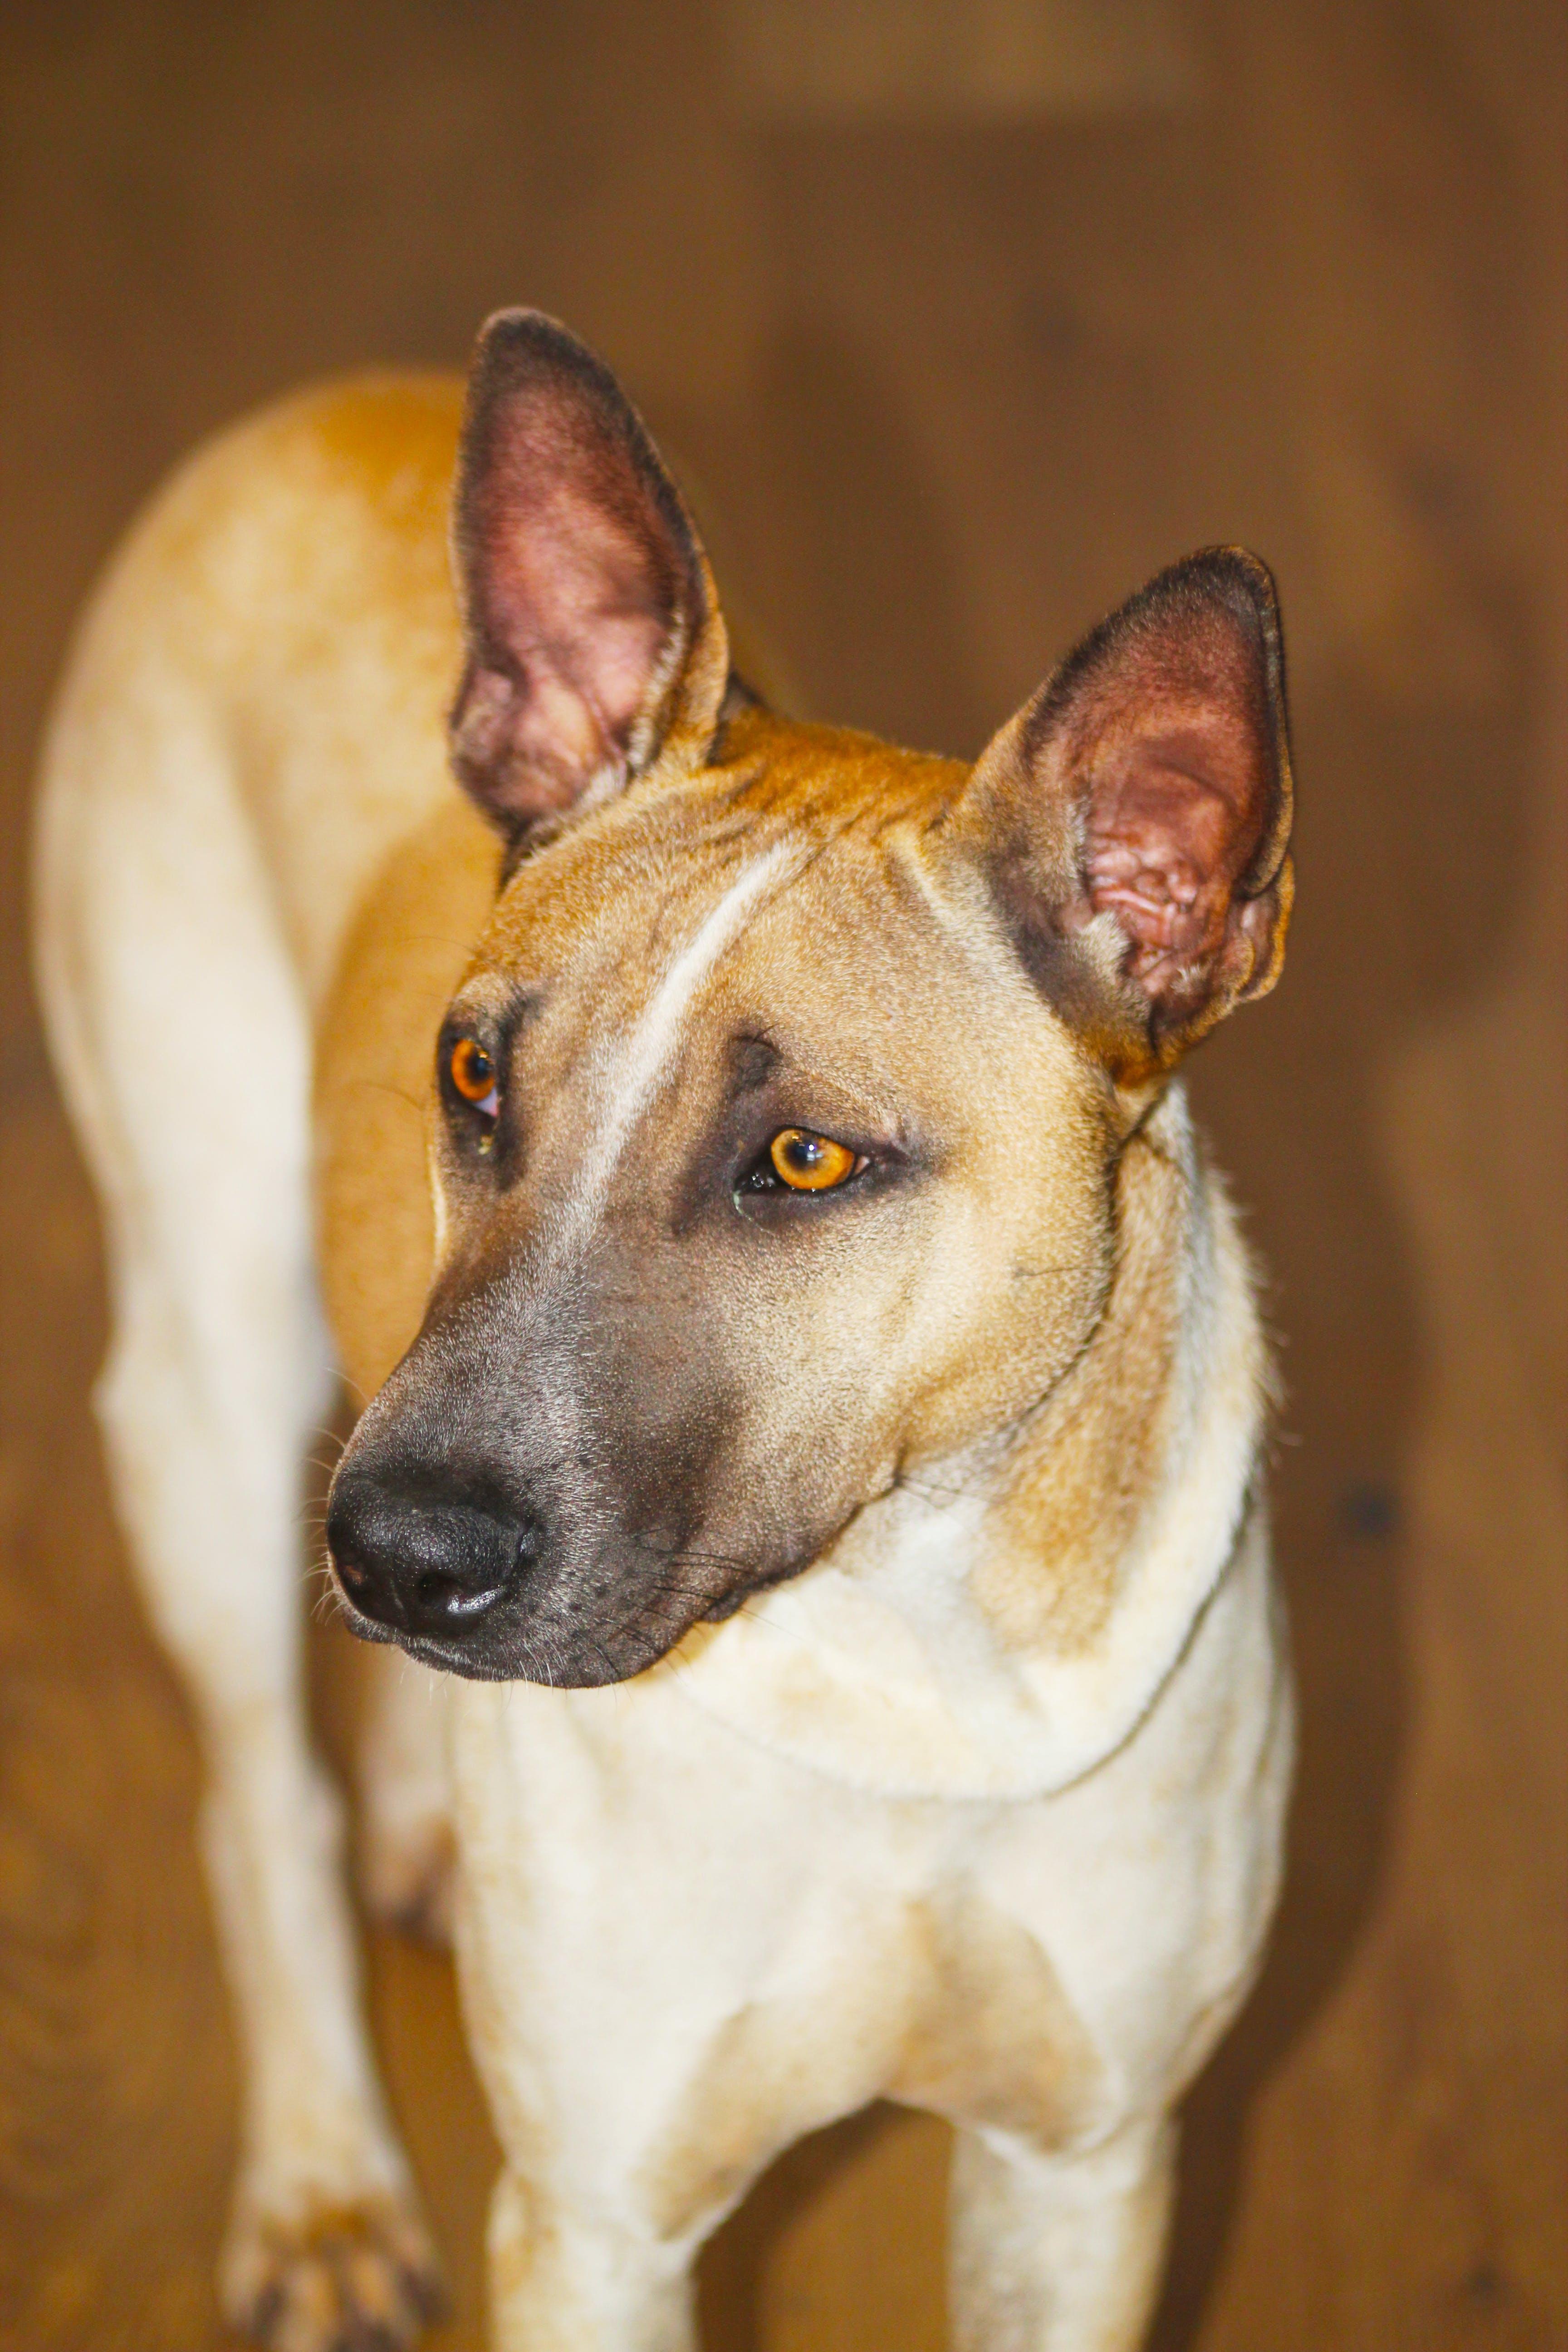 Free stock photo of #dog#DOG#pat#PAT#cute#CUTE#beauty#BEAUTY#MYDOG